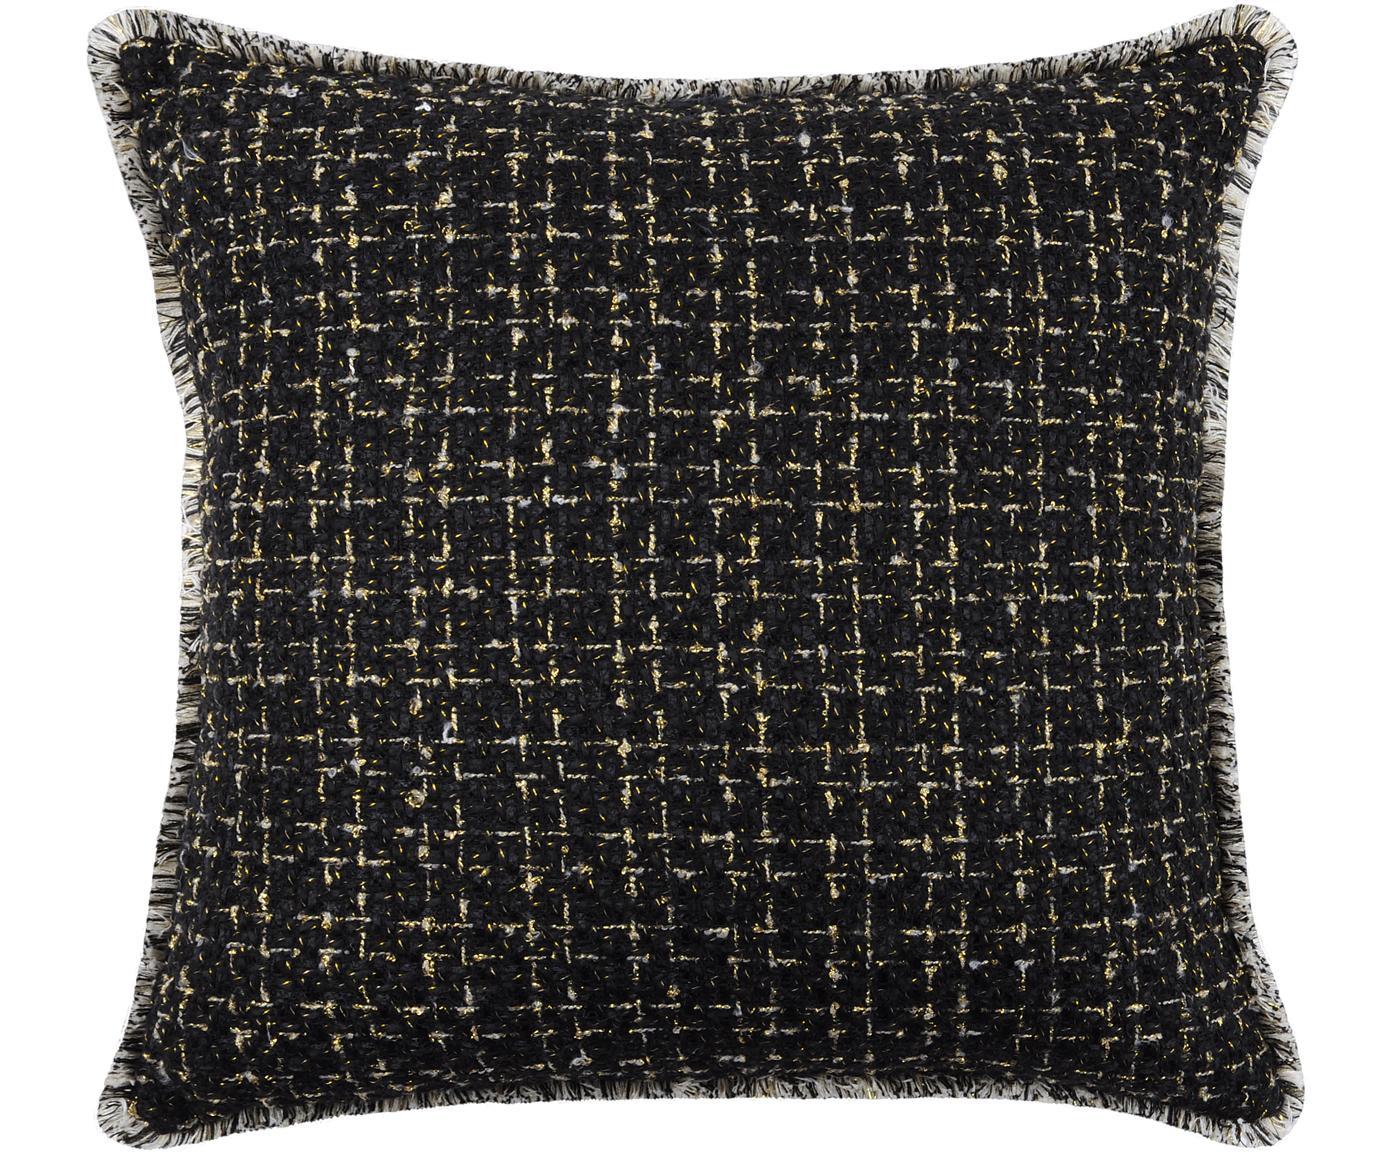 Kussenhoes Walter, 50% katoen 50% polyester, Zwart, goudkleurig, 40 x 40 cm